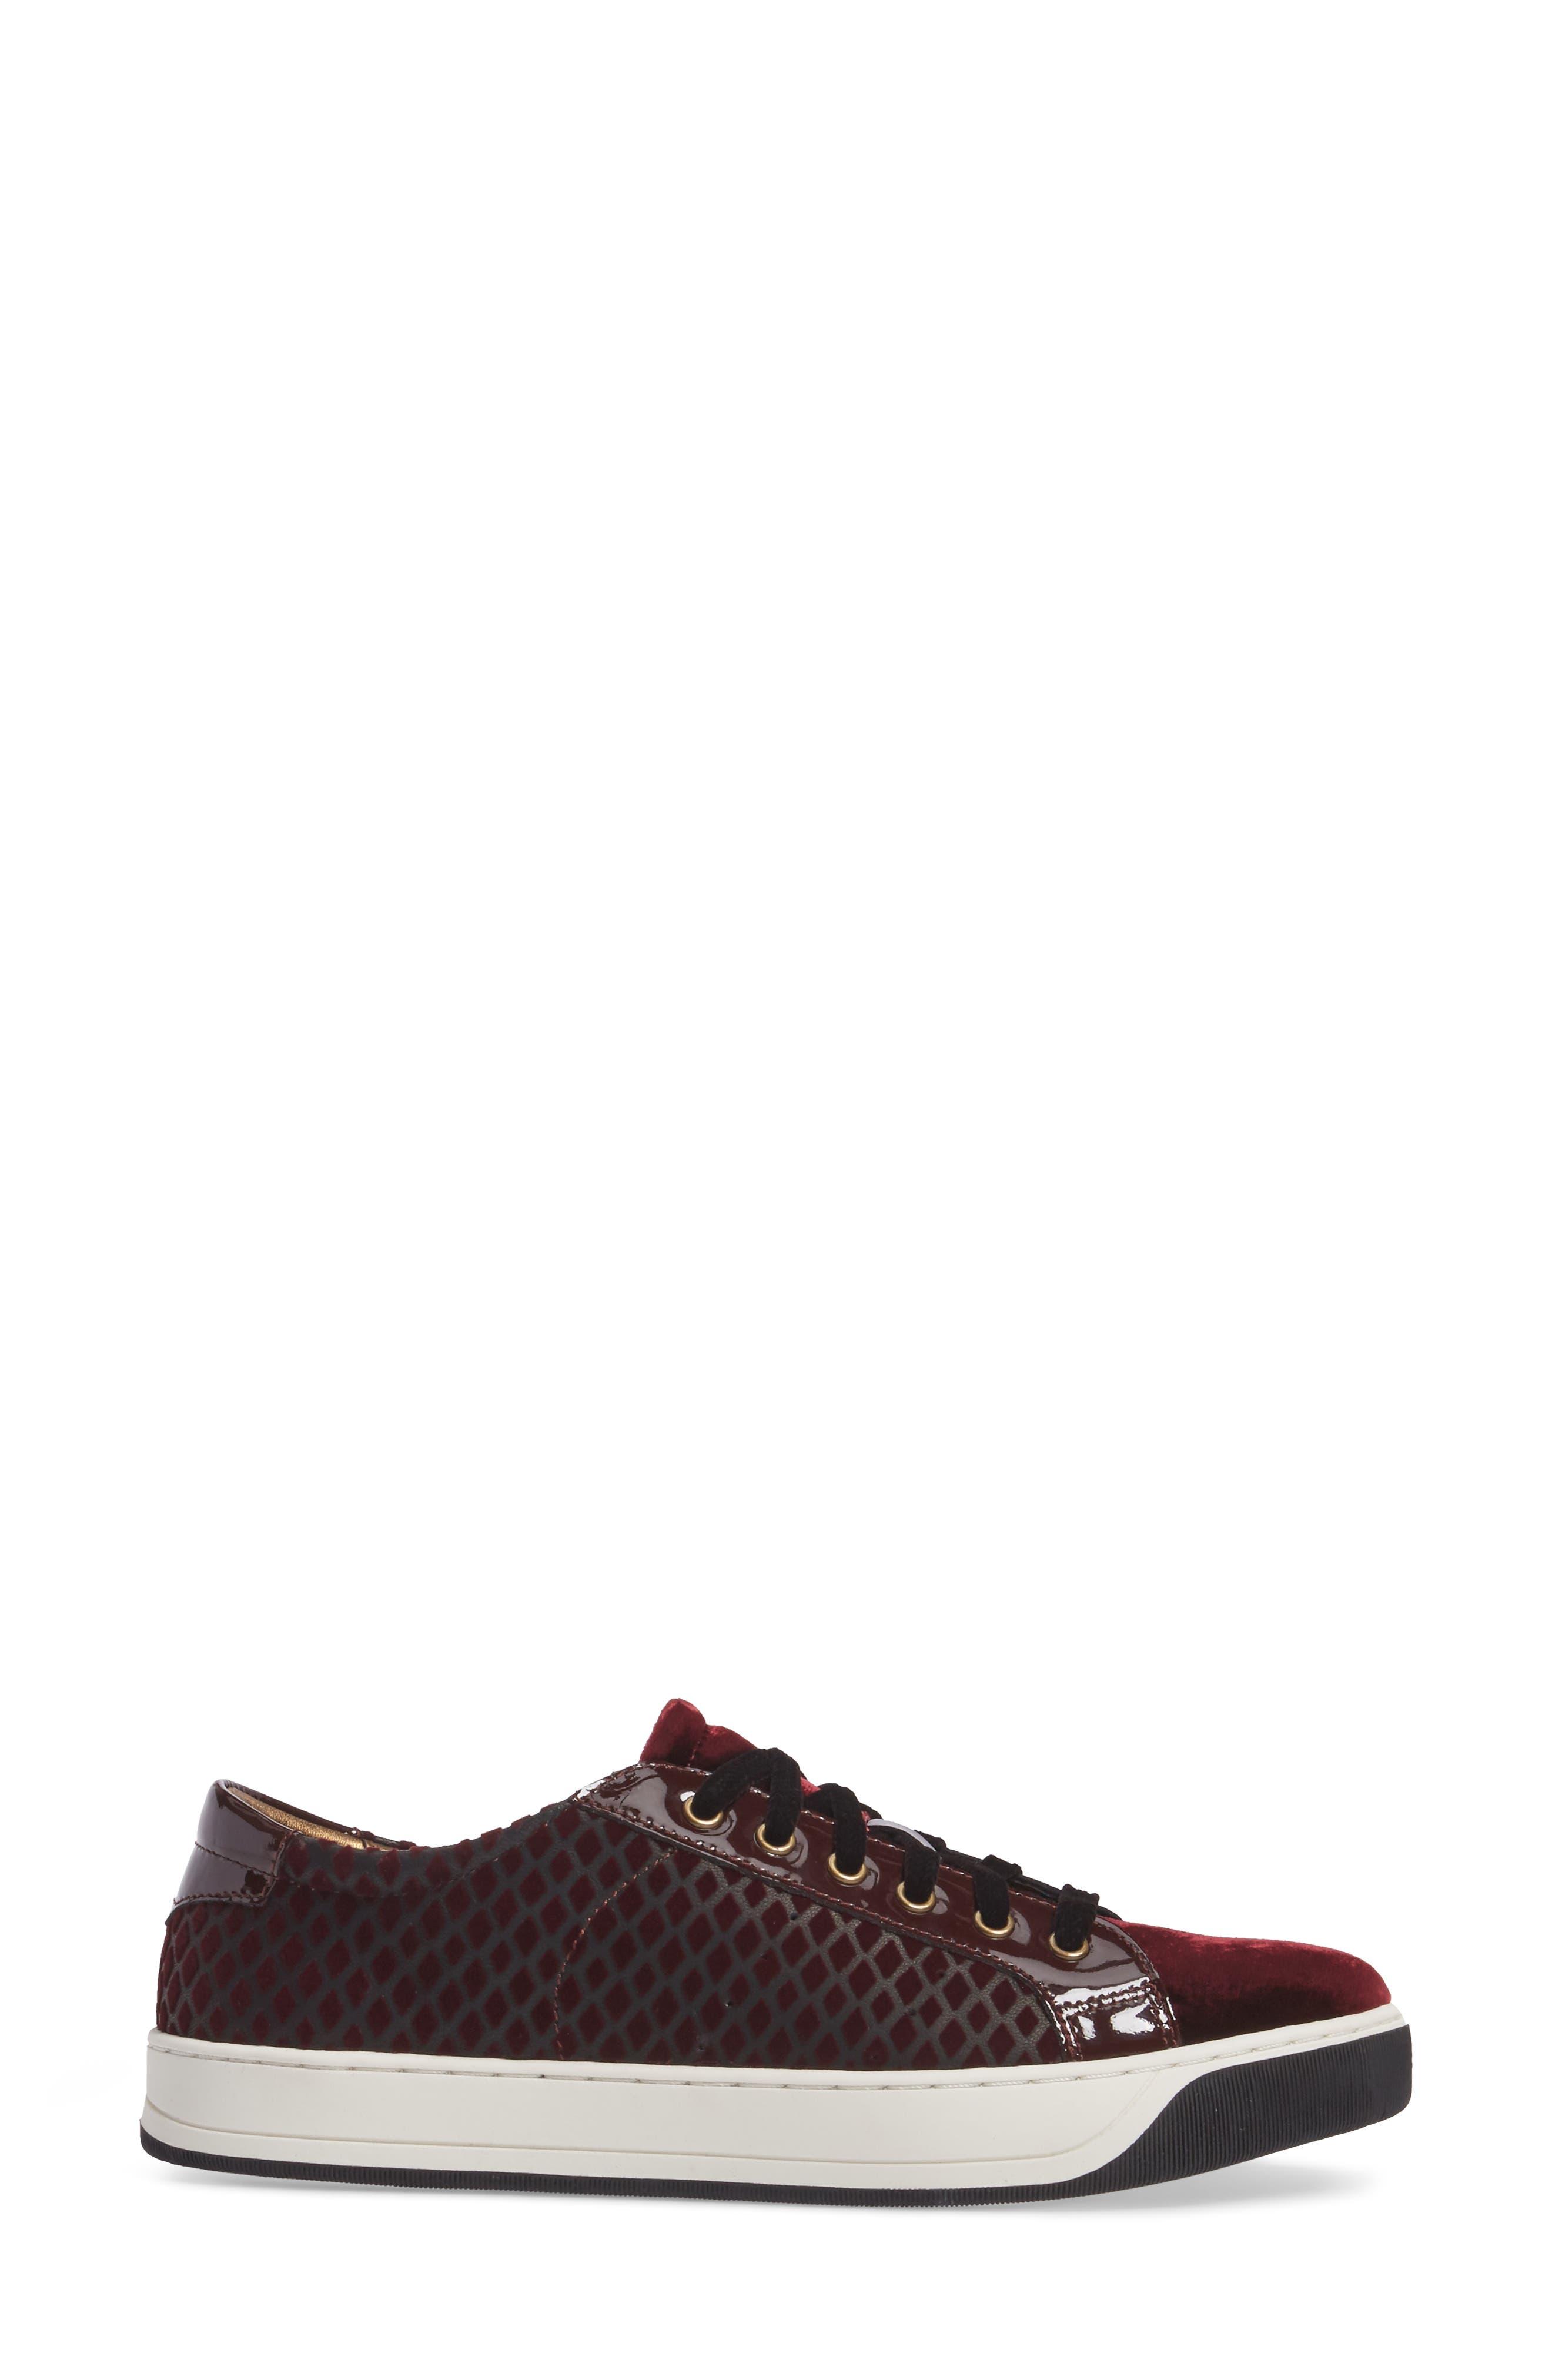 Alternate Image 3  - Johnston & Murphy 'Emerson' Sneaker (Women)